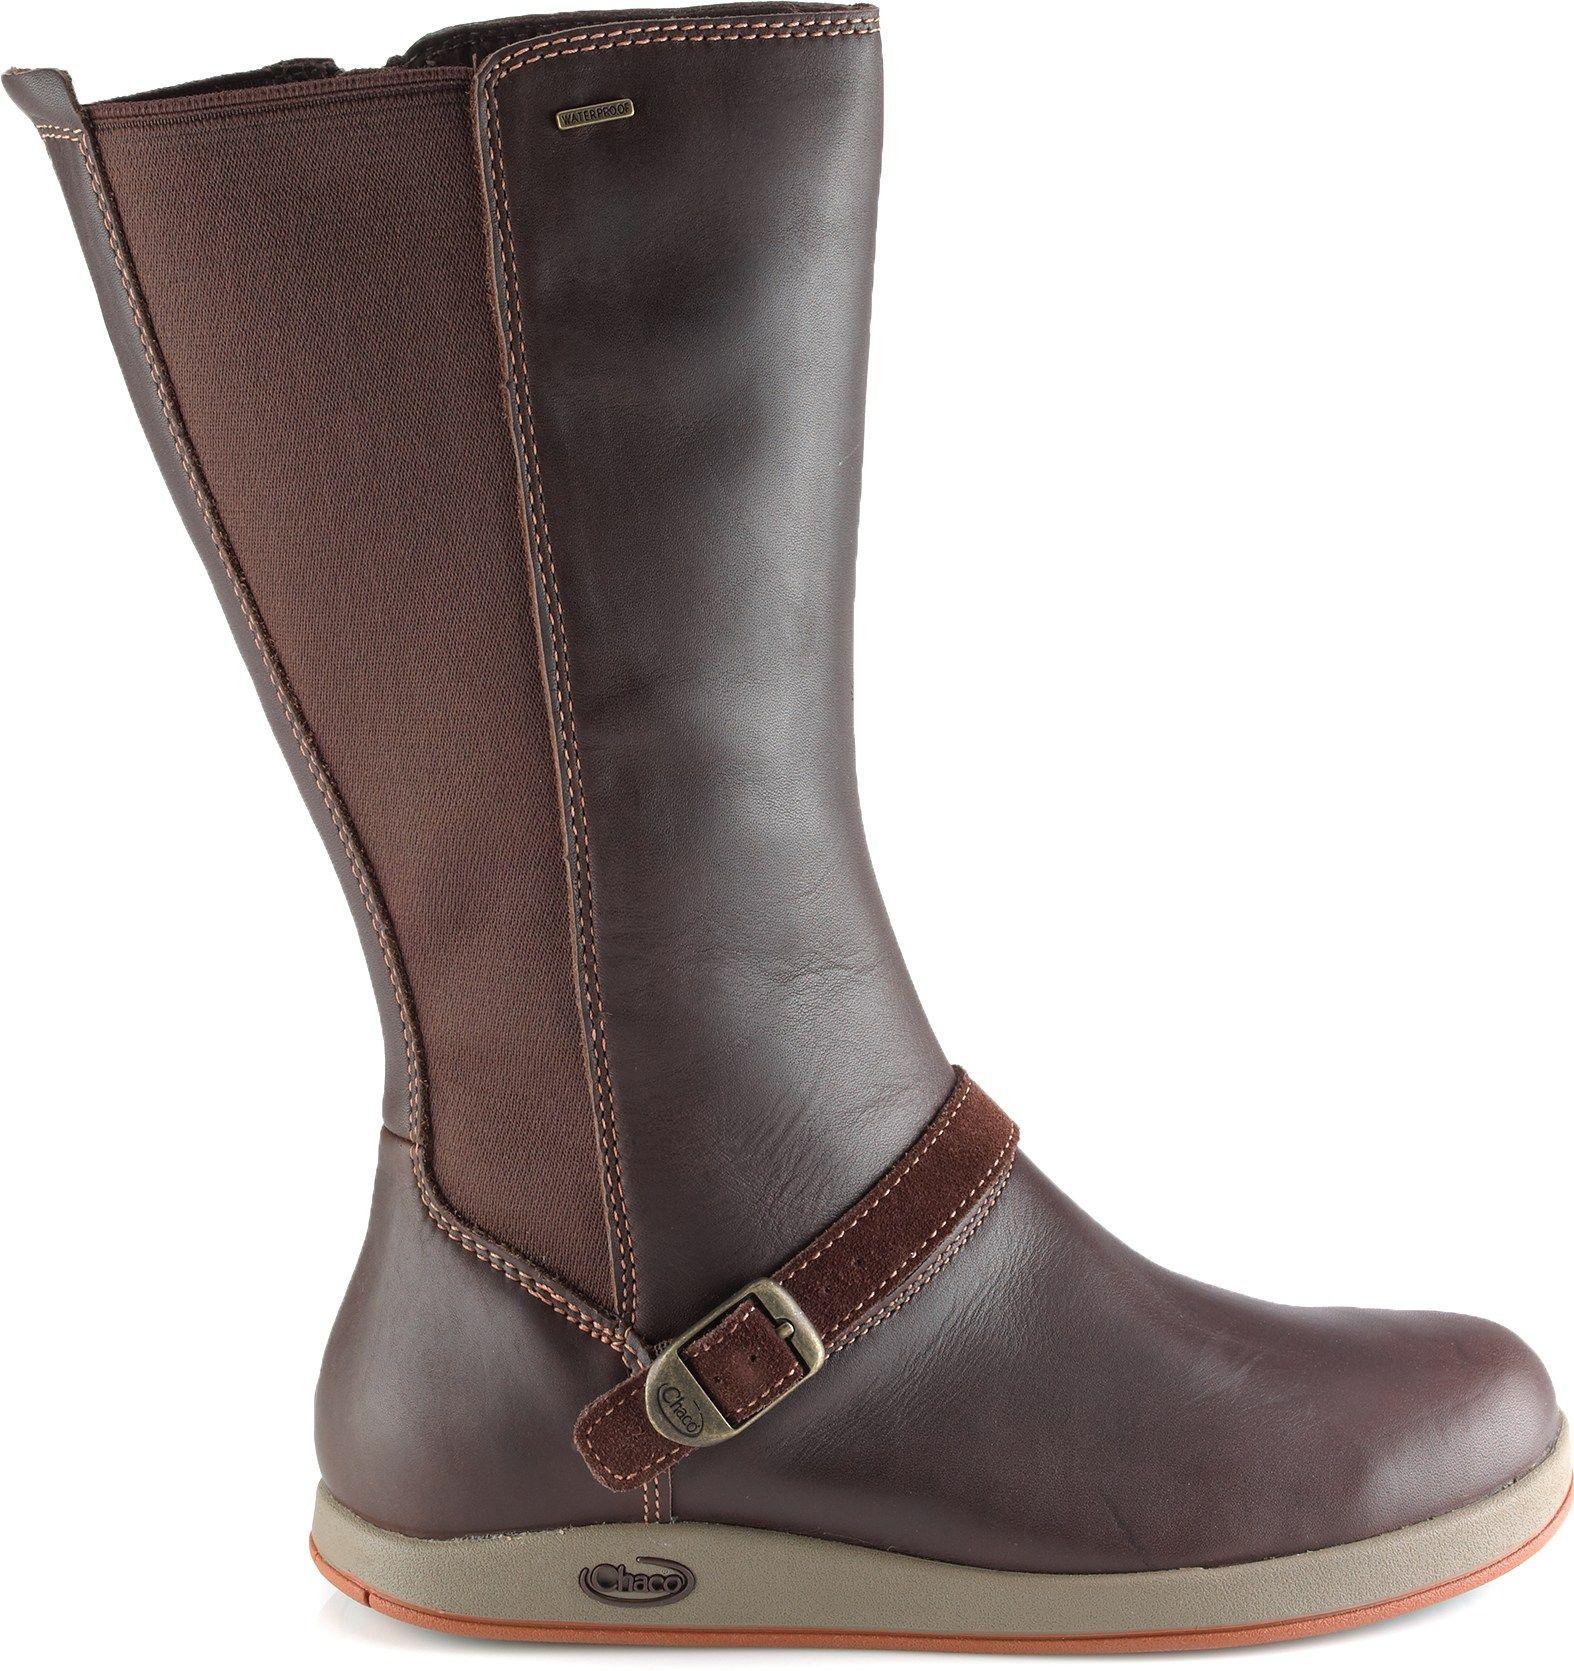 2a8434420ba Details about merrell Womens Captiva Waterproof Knee boots, Espresso ...